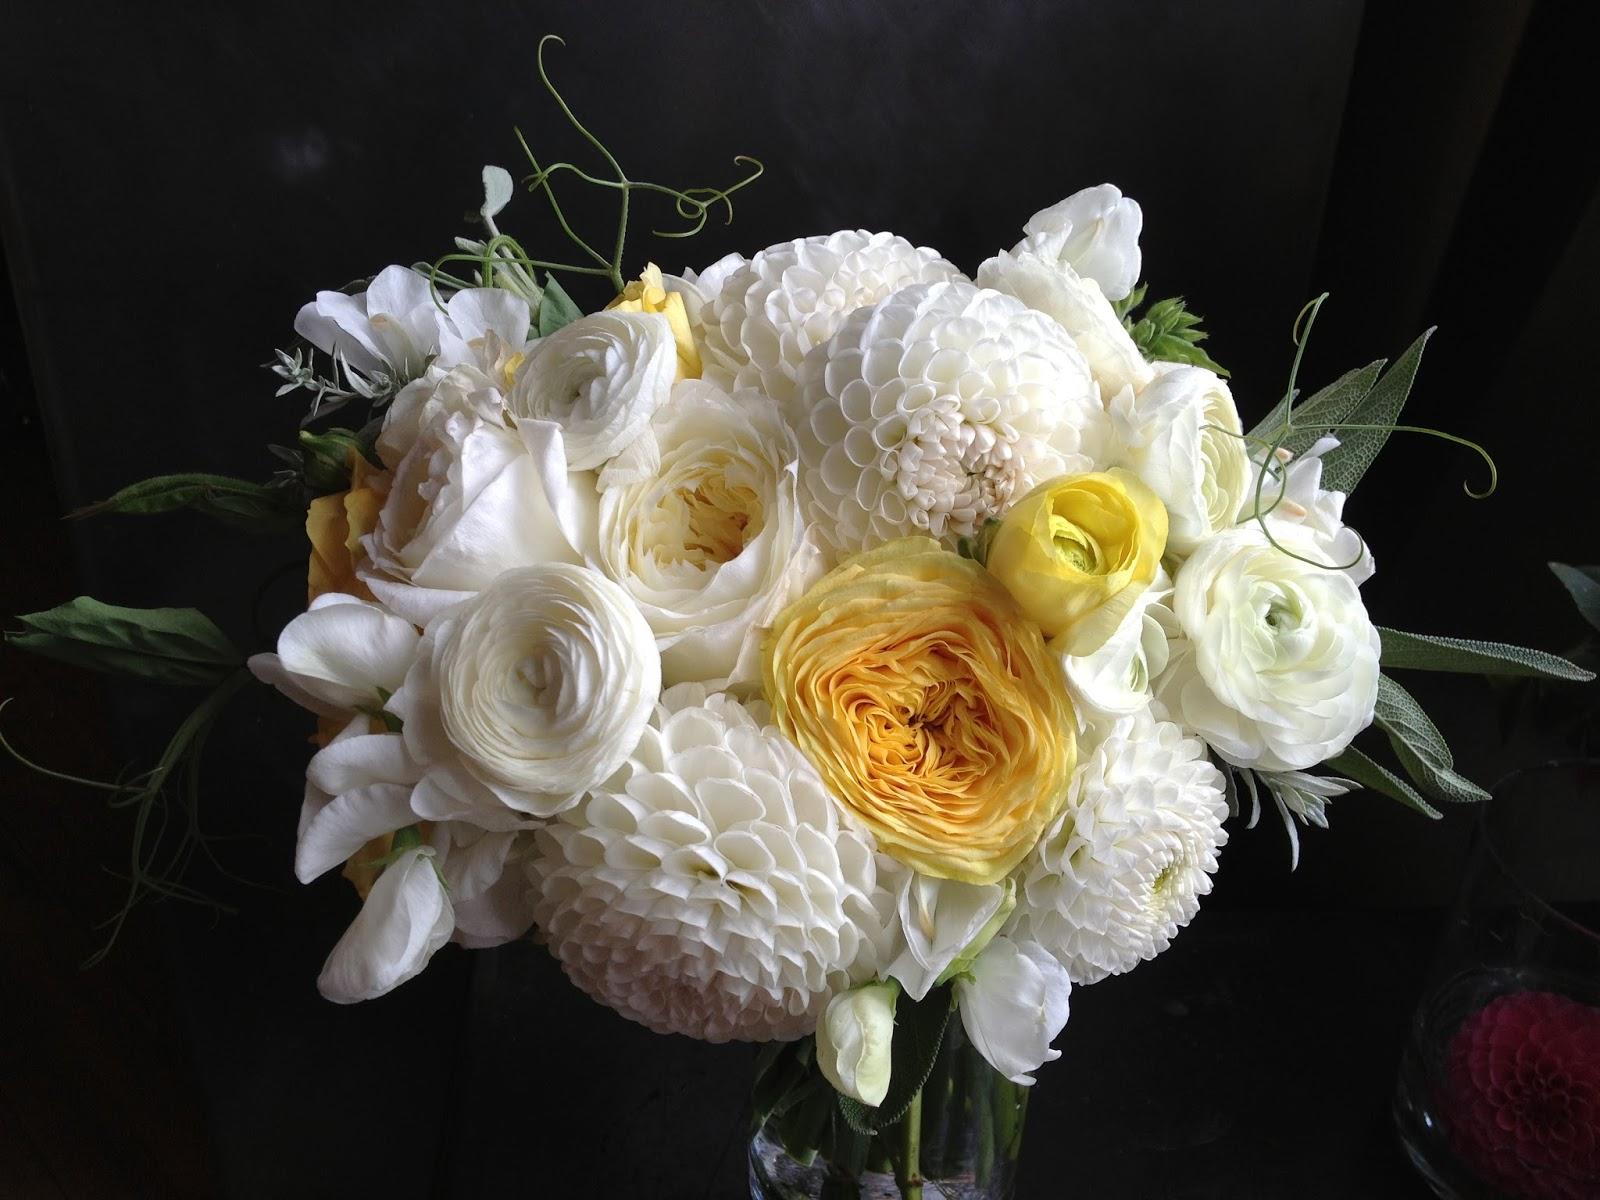 anna mara flowers portland or wedding florist. Black Bedroom Furniture Sets. Home Design Ideas